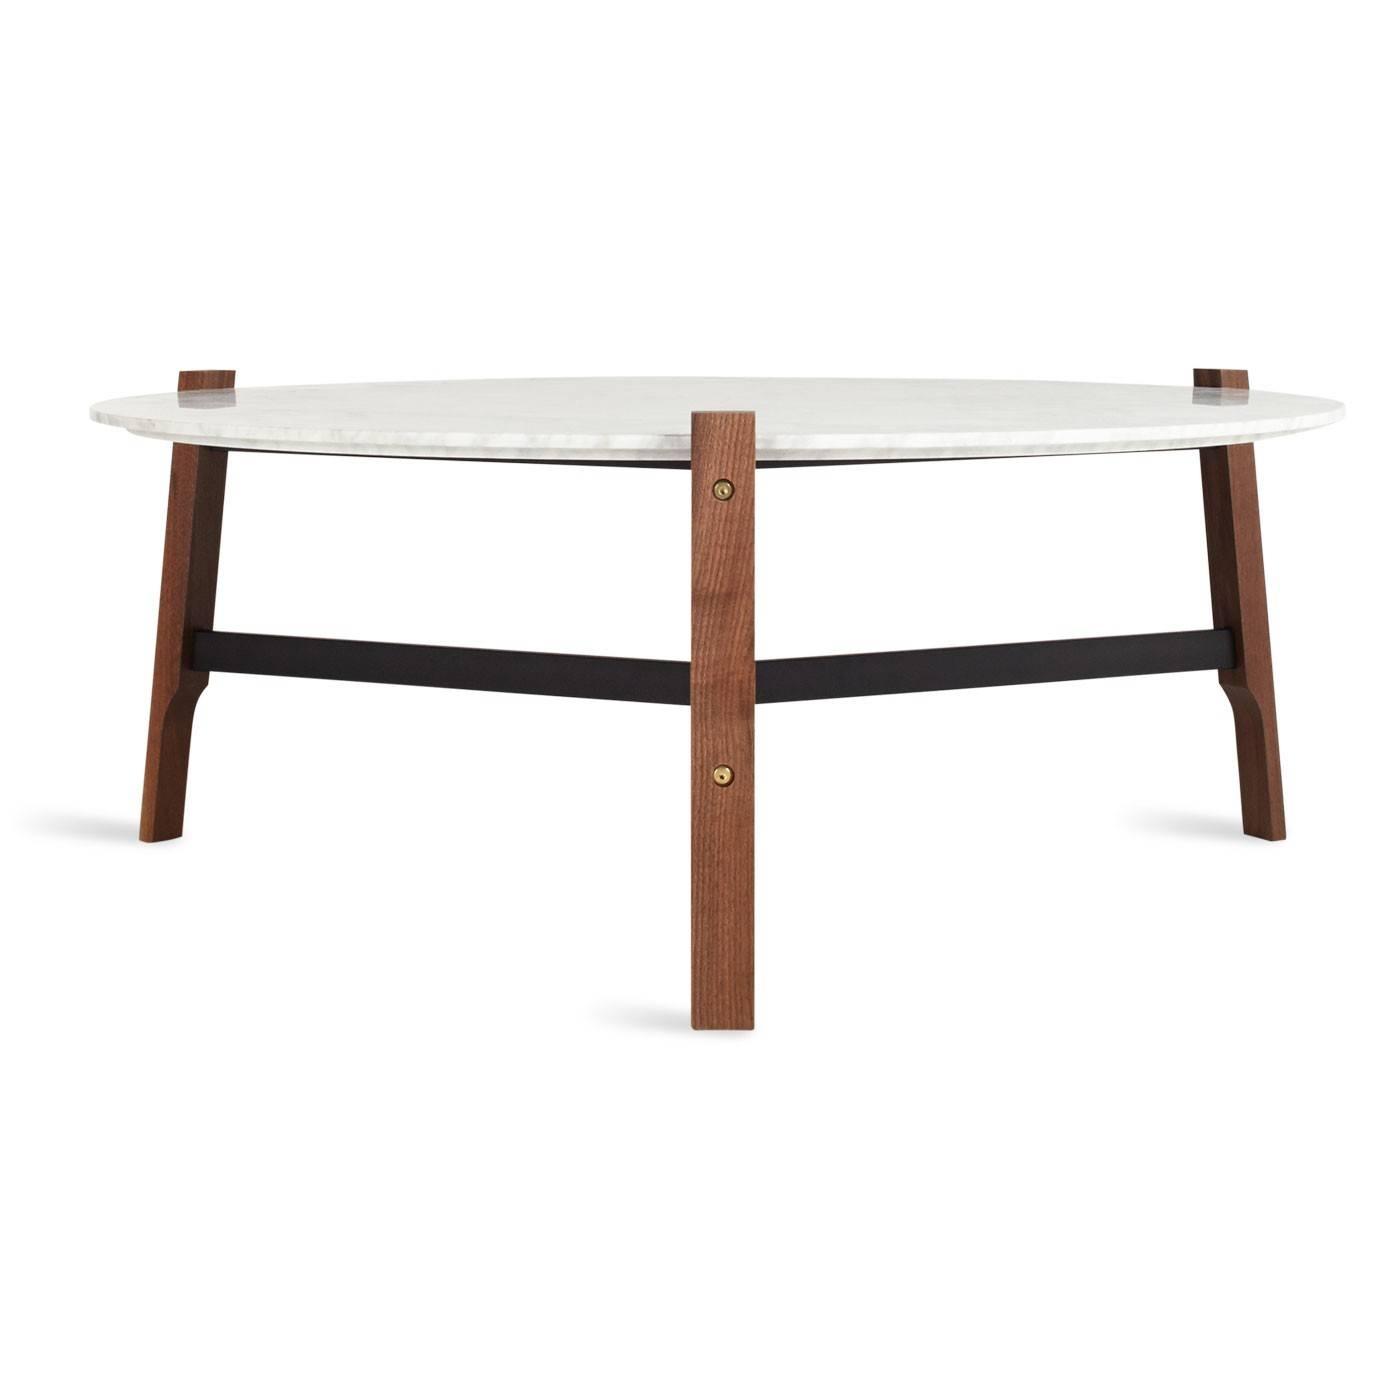 Free Range Coffee Table - Round Marble Coffee Table | Blu Dot for Marble Round Coffee Tables (Image 19 of 30)